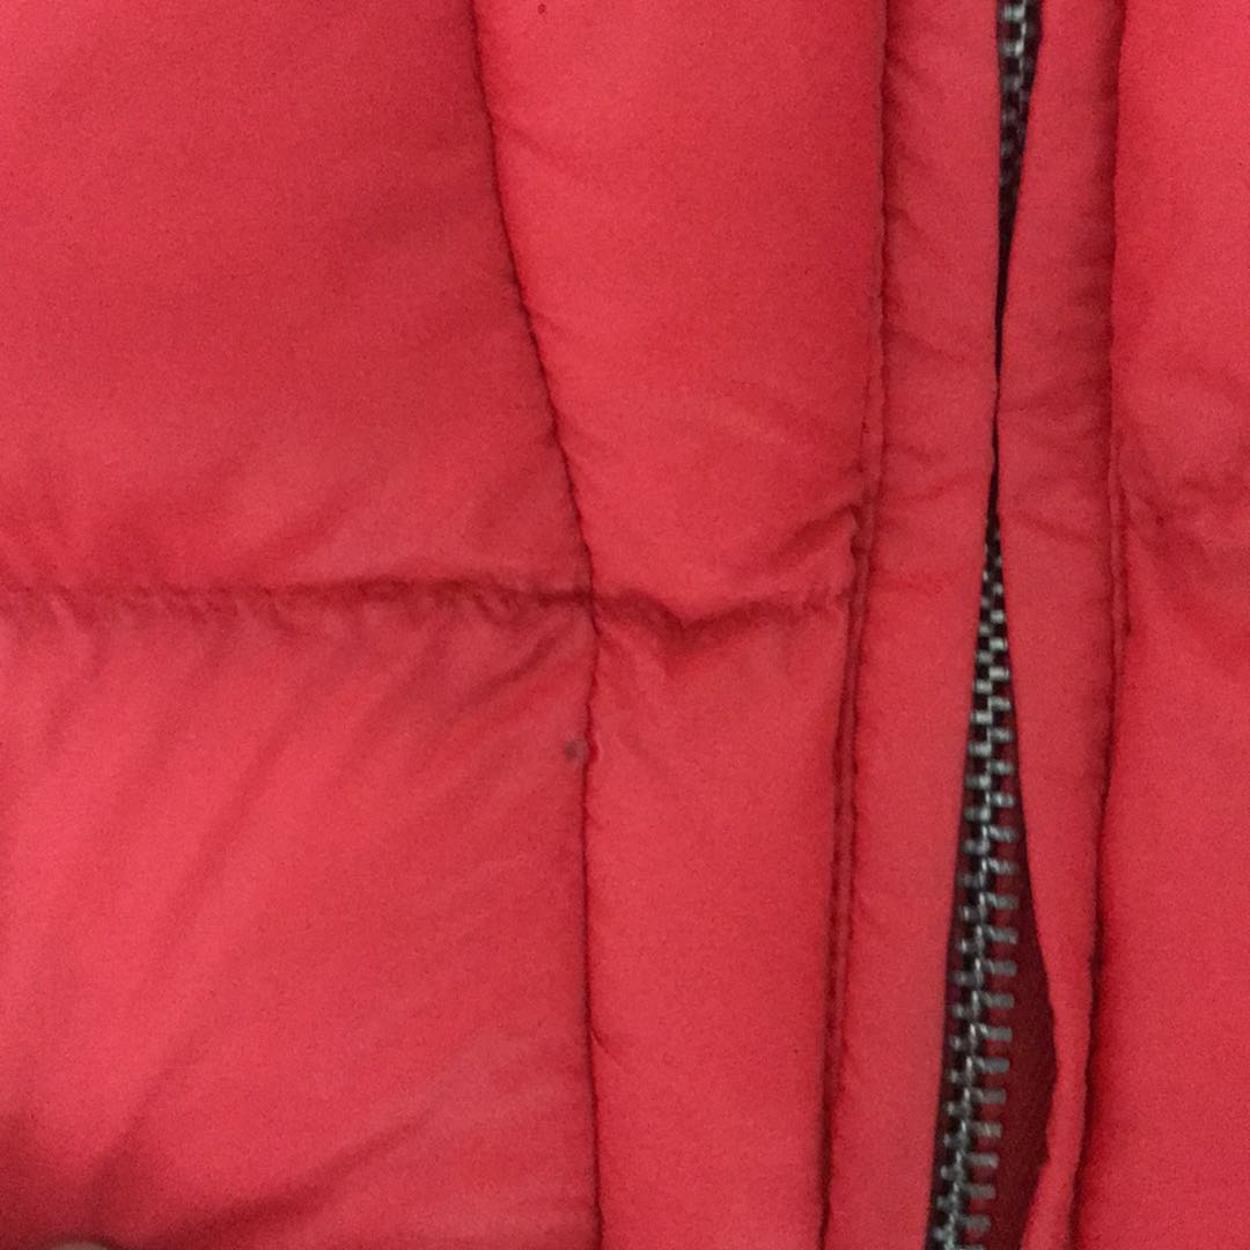 Prada Ceket/Blazer